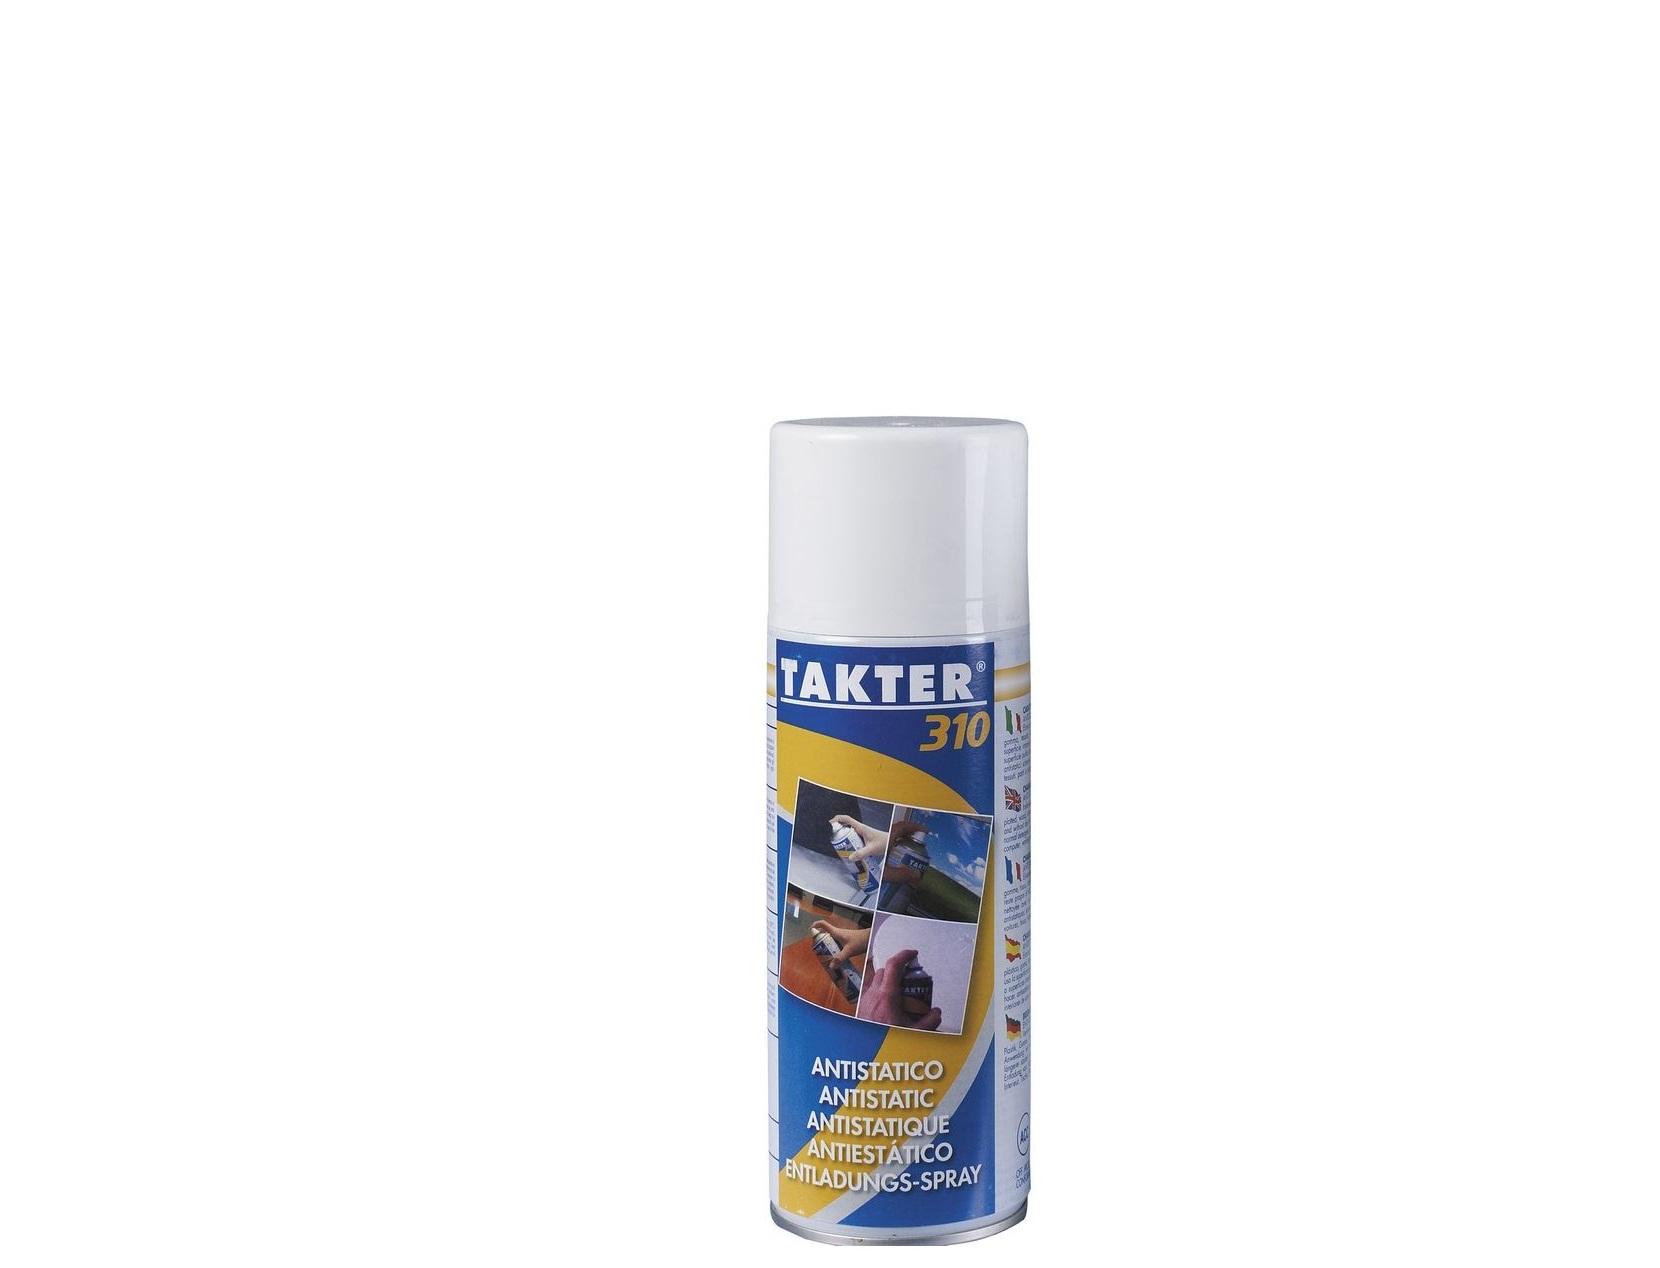 TAKTER 310 (0,4 L) antistatinis purškiklis